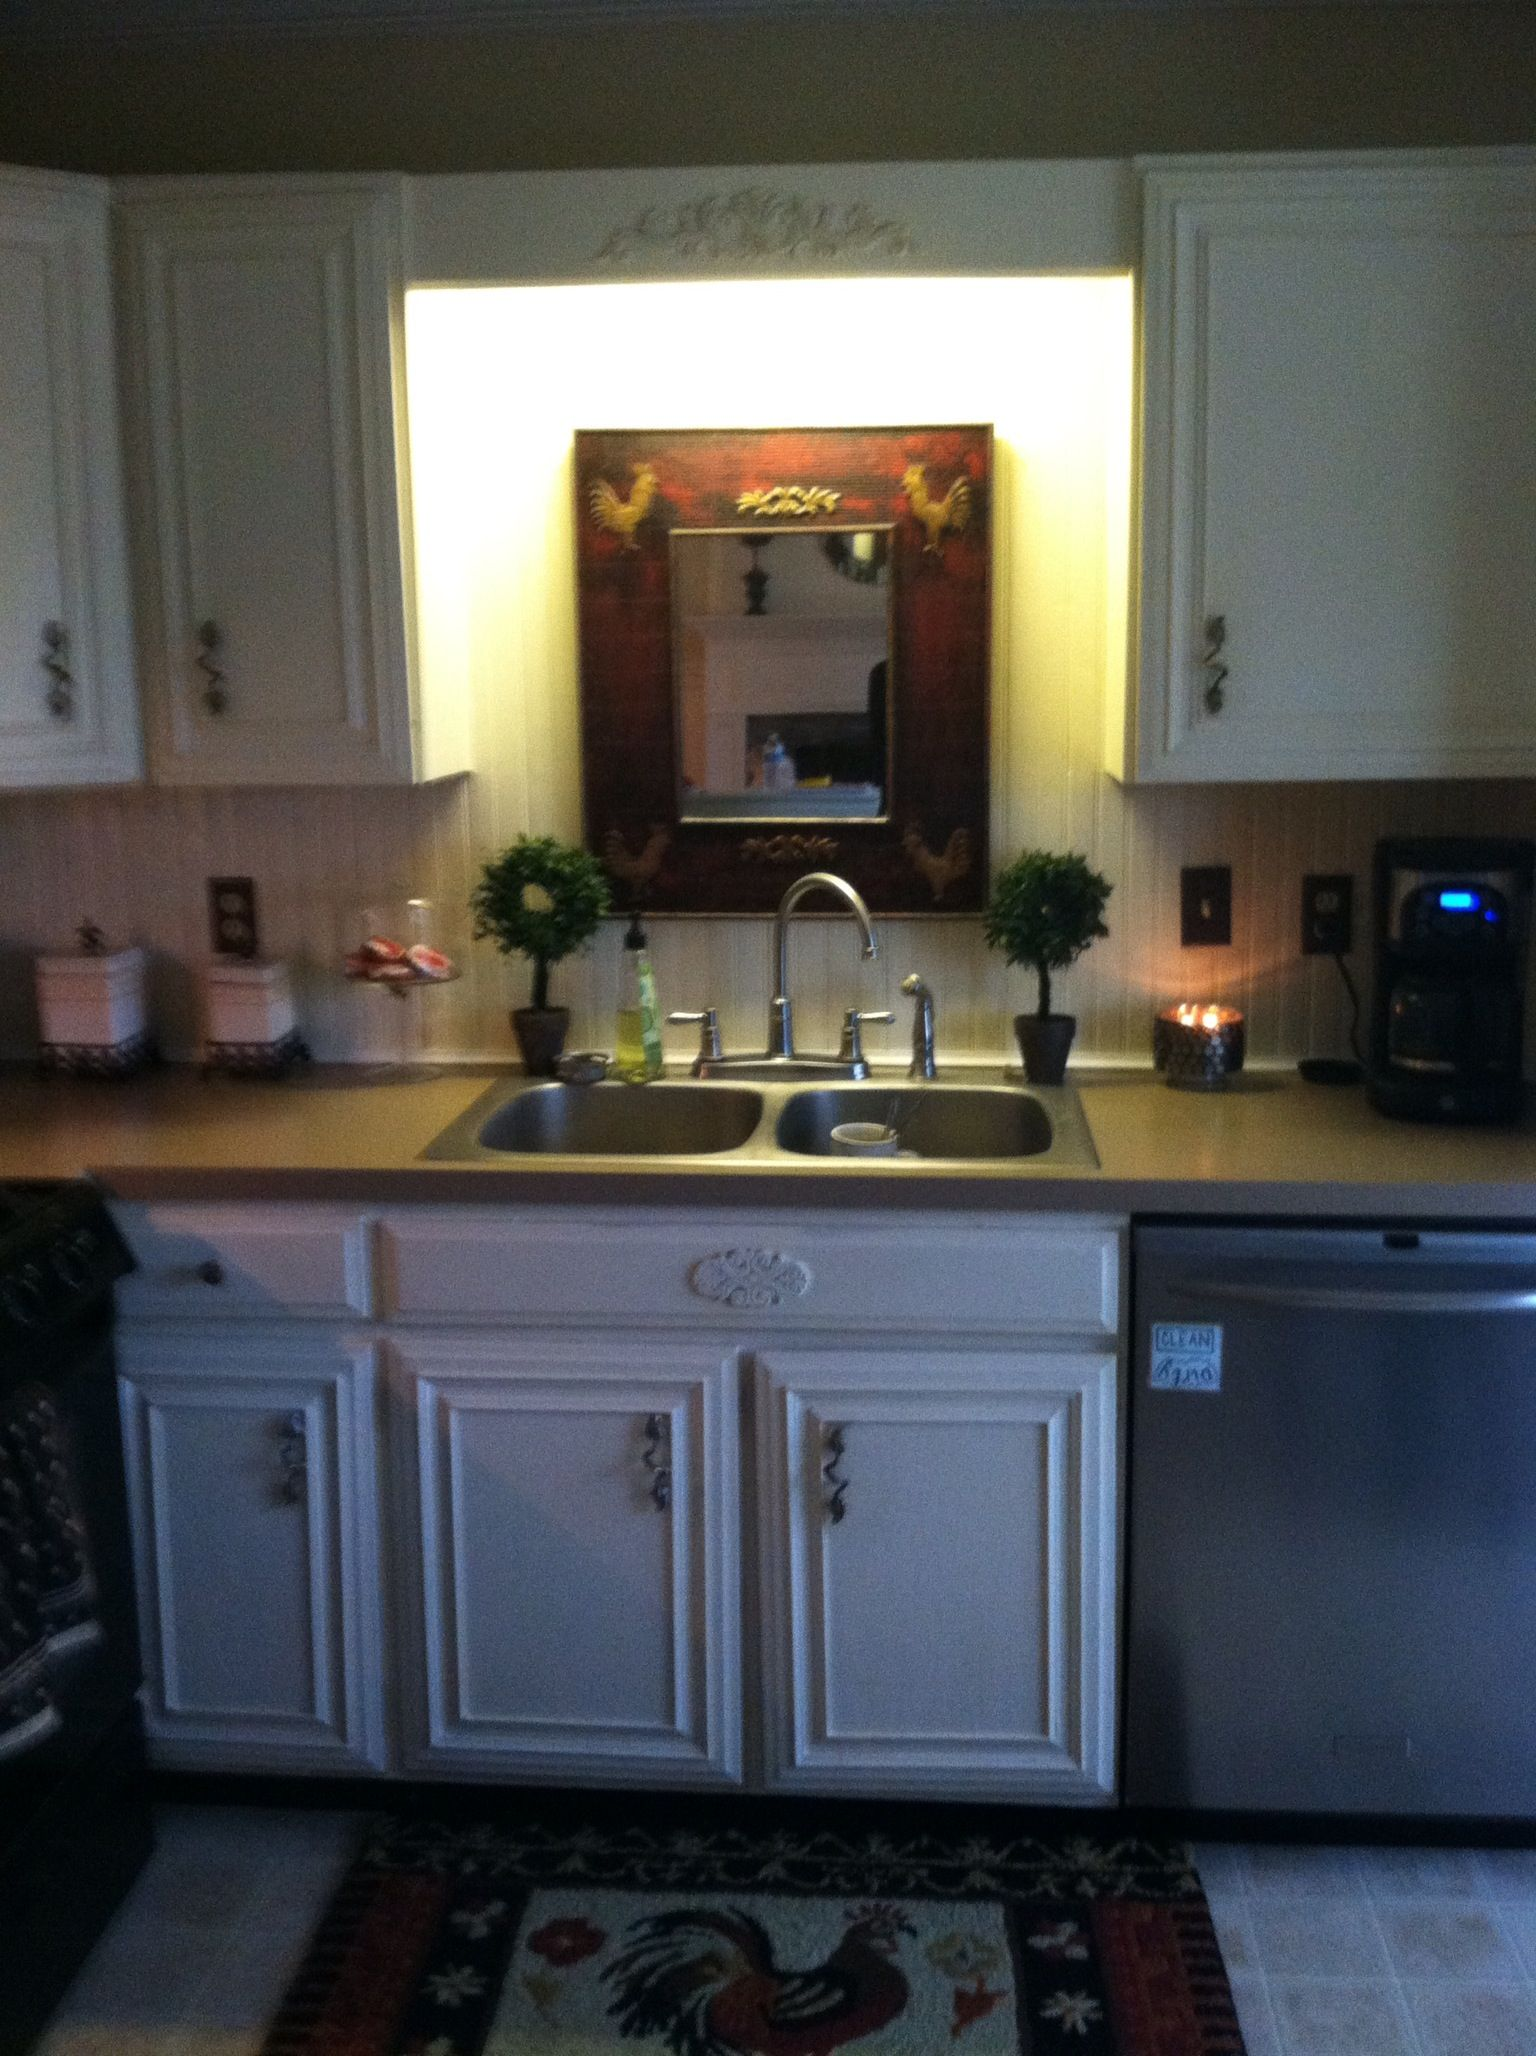 Wainscot backsplash and painted Formica countertop